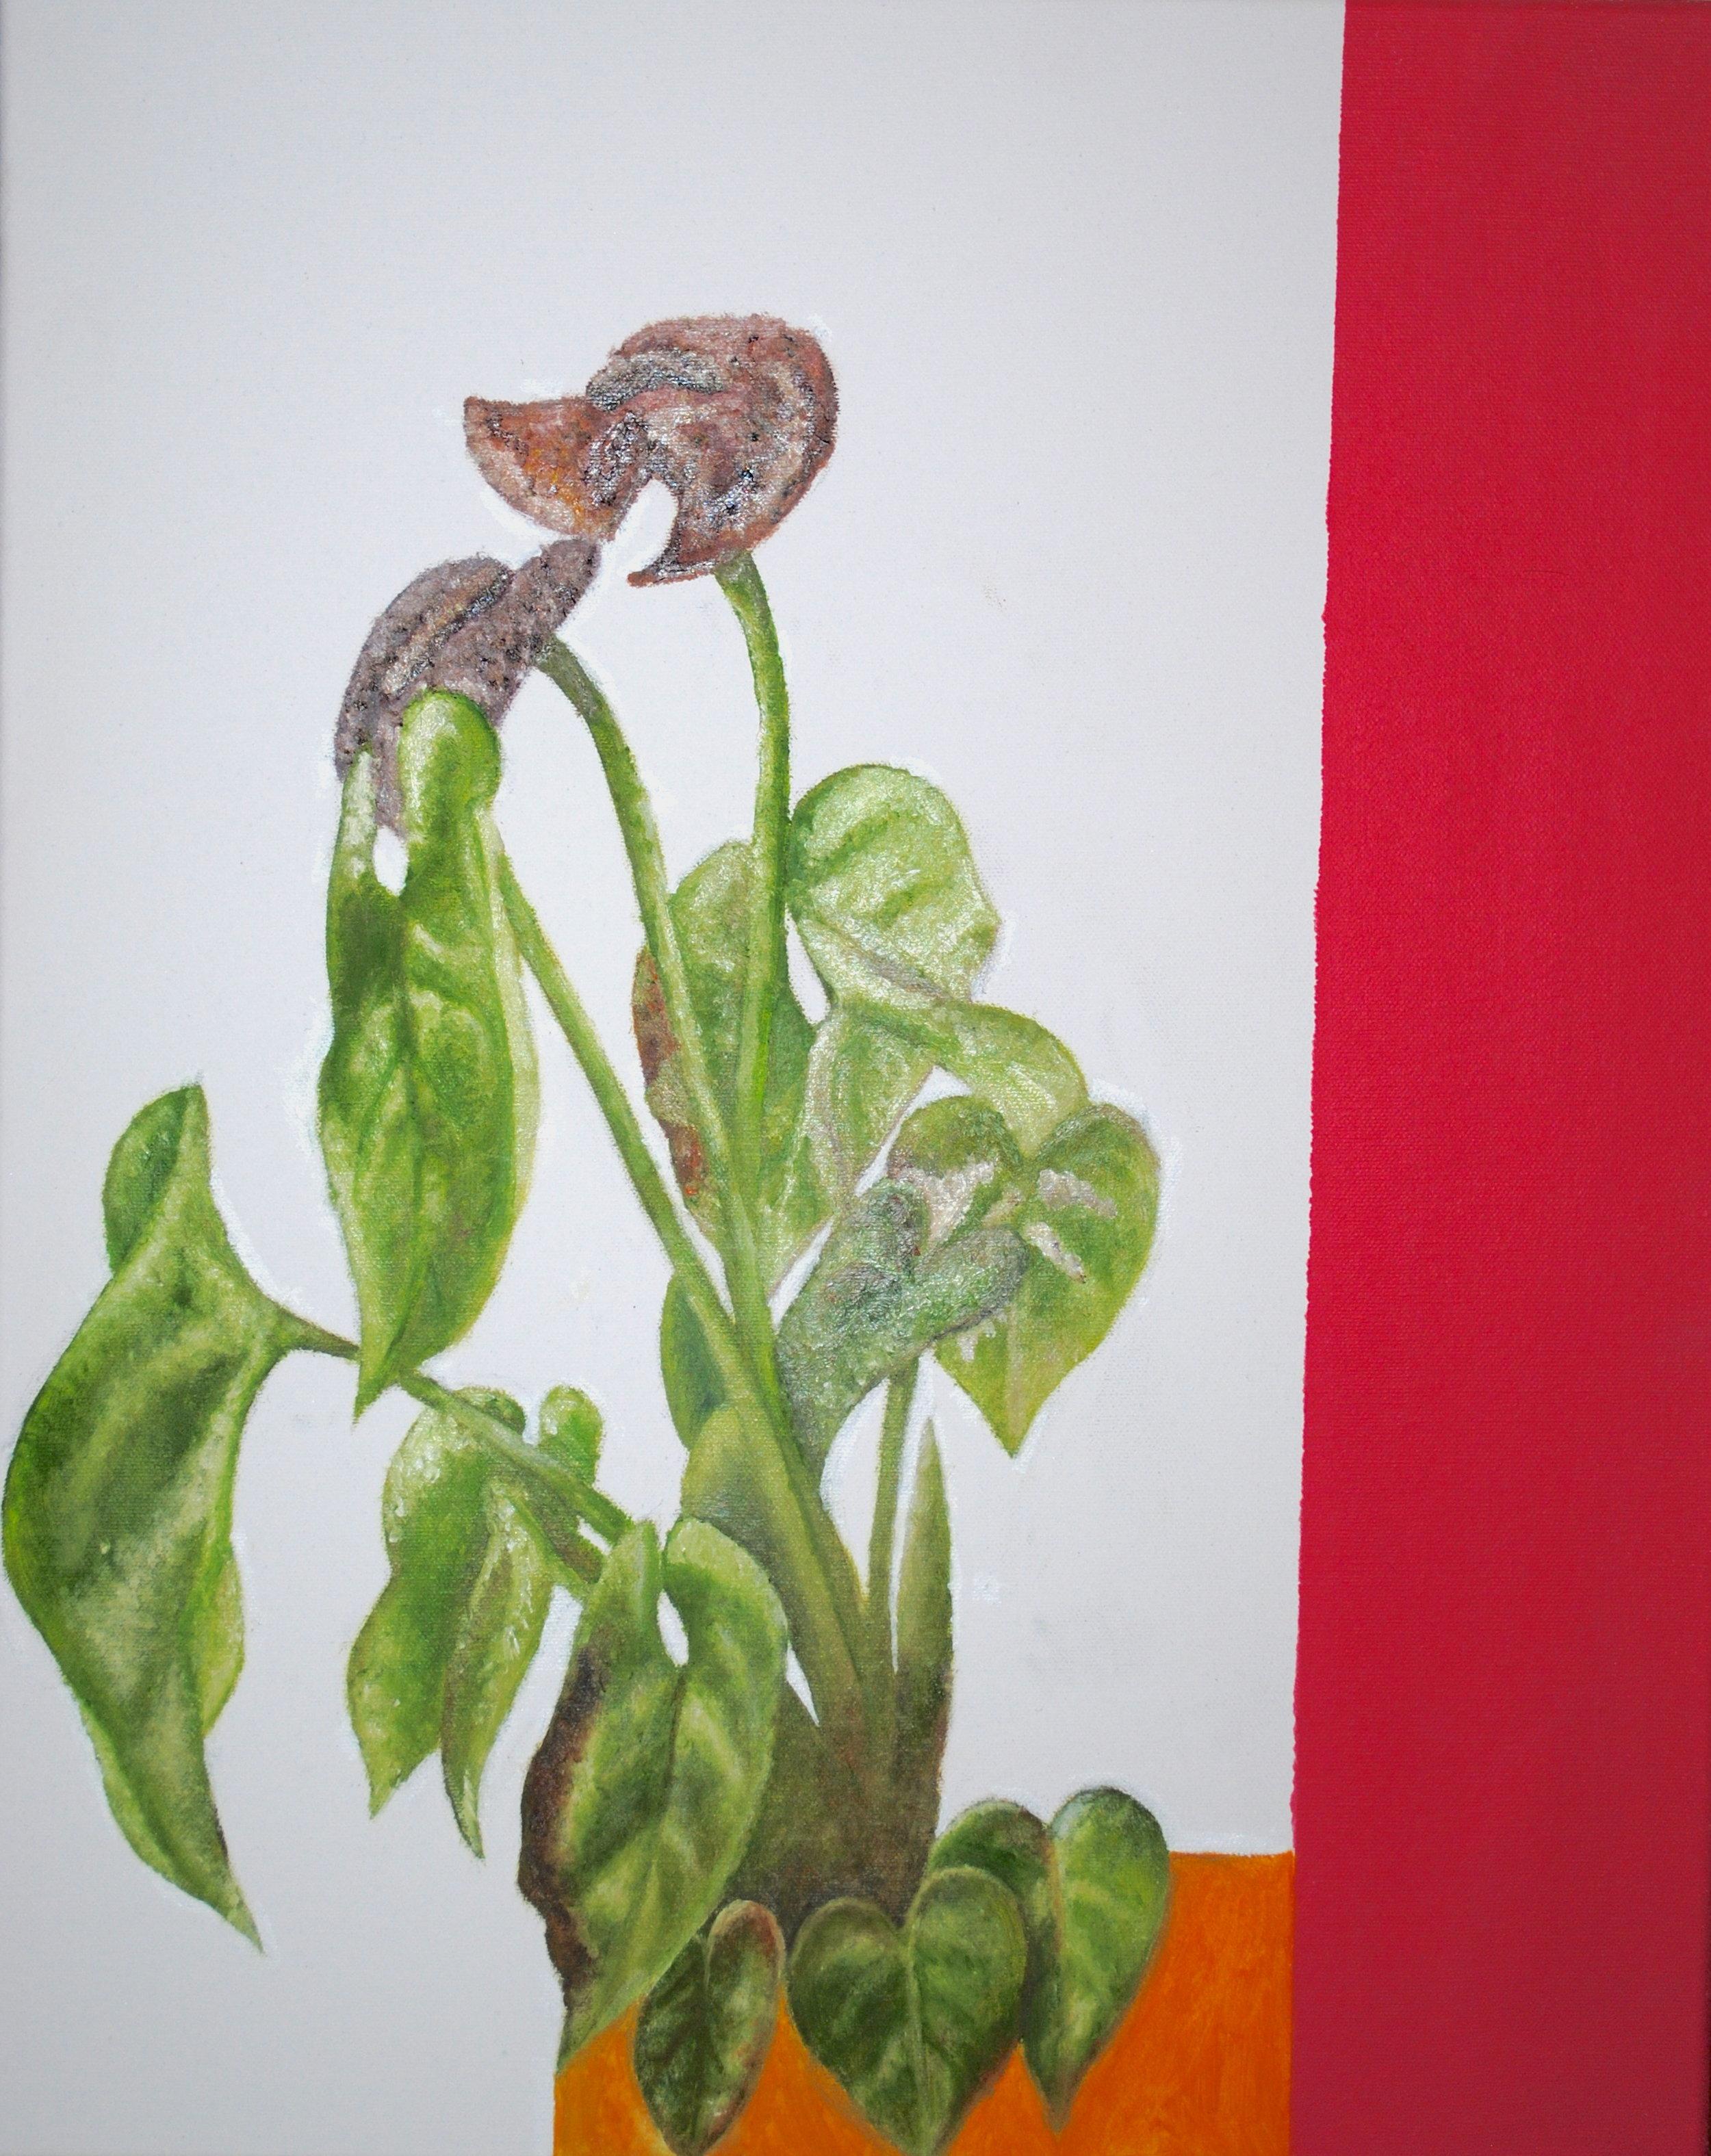 Plants (2018)